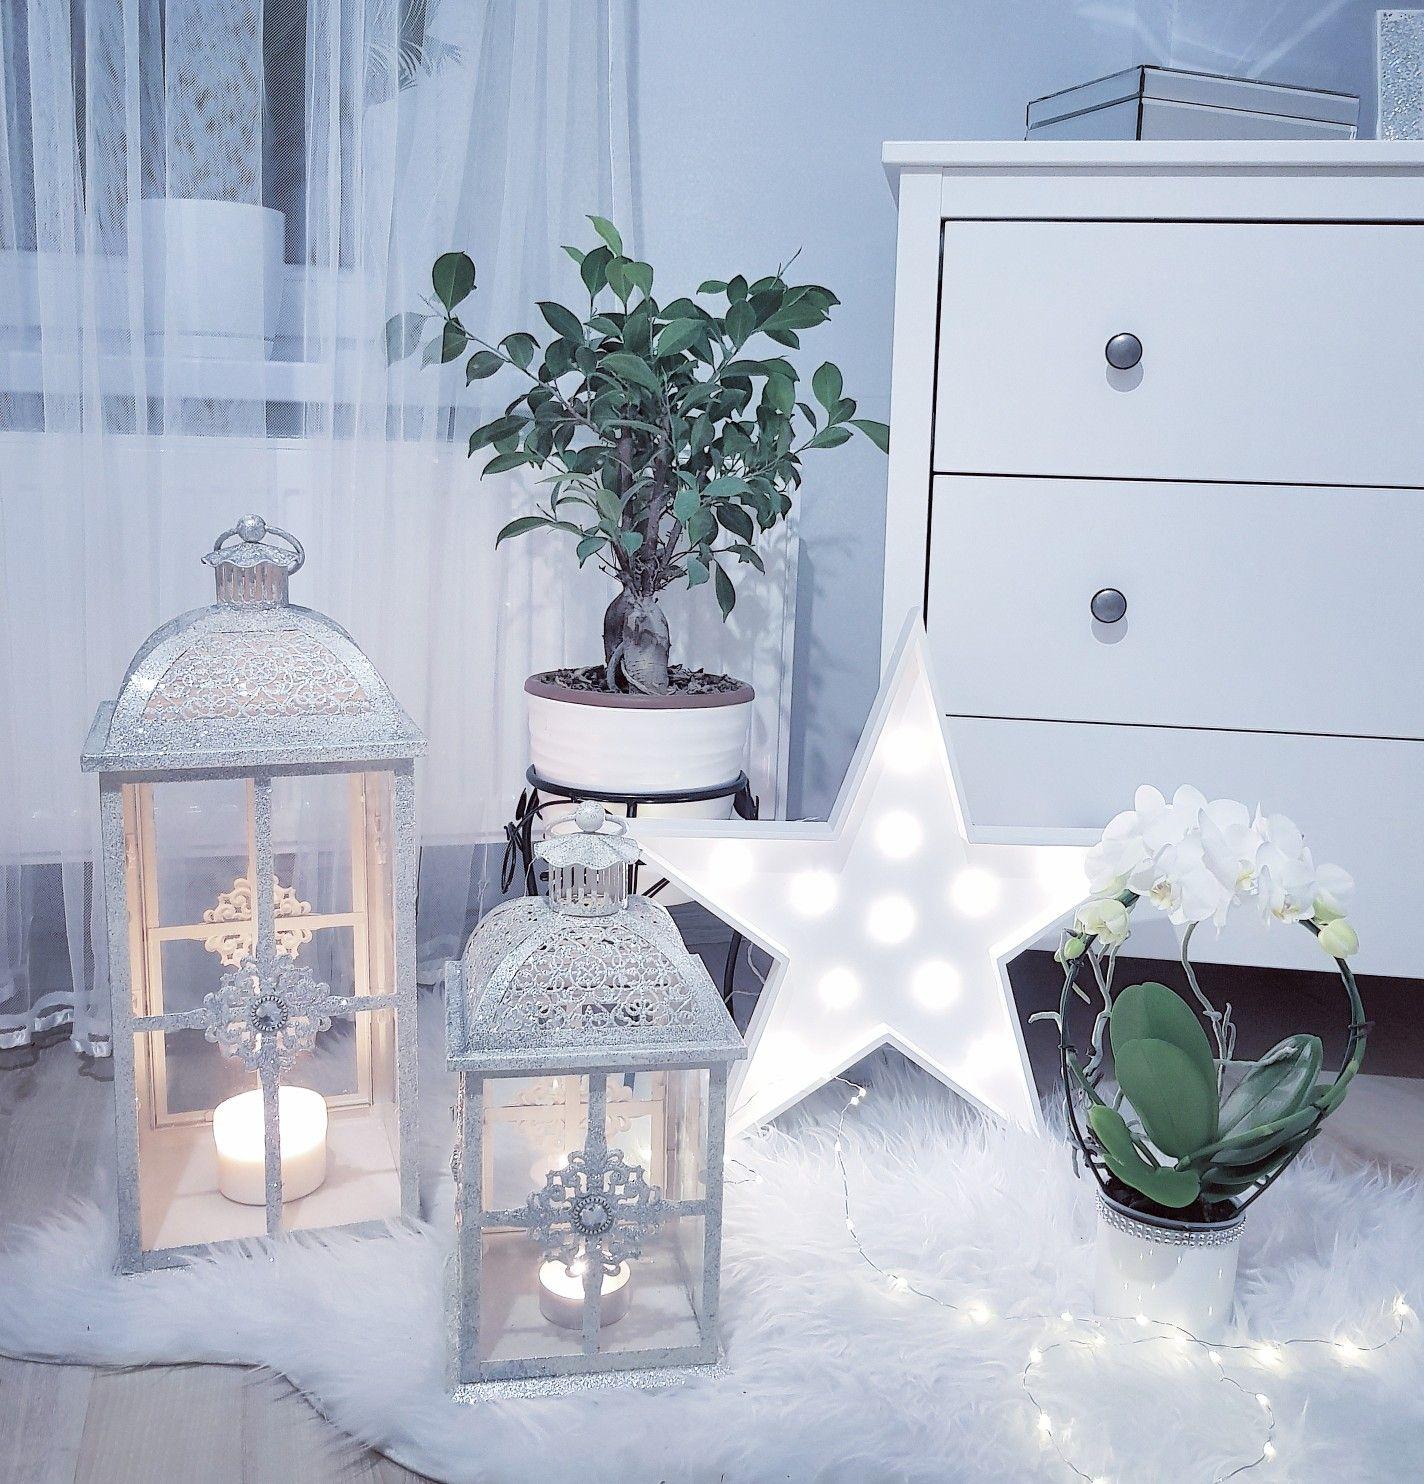 Home You Lampiony Christmas Star Gwiazda Storczyk Ikea Pepco Home Decor Candle Decor Home Deco